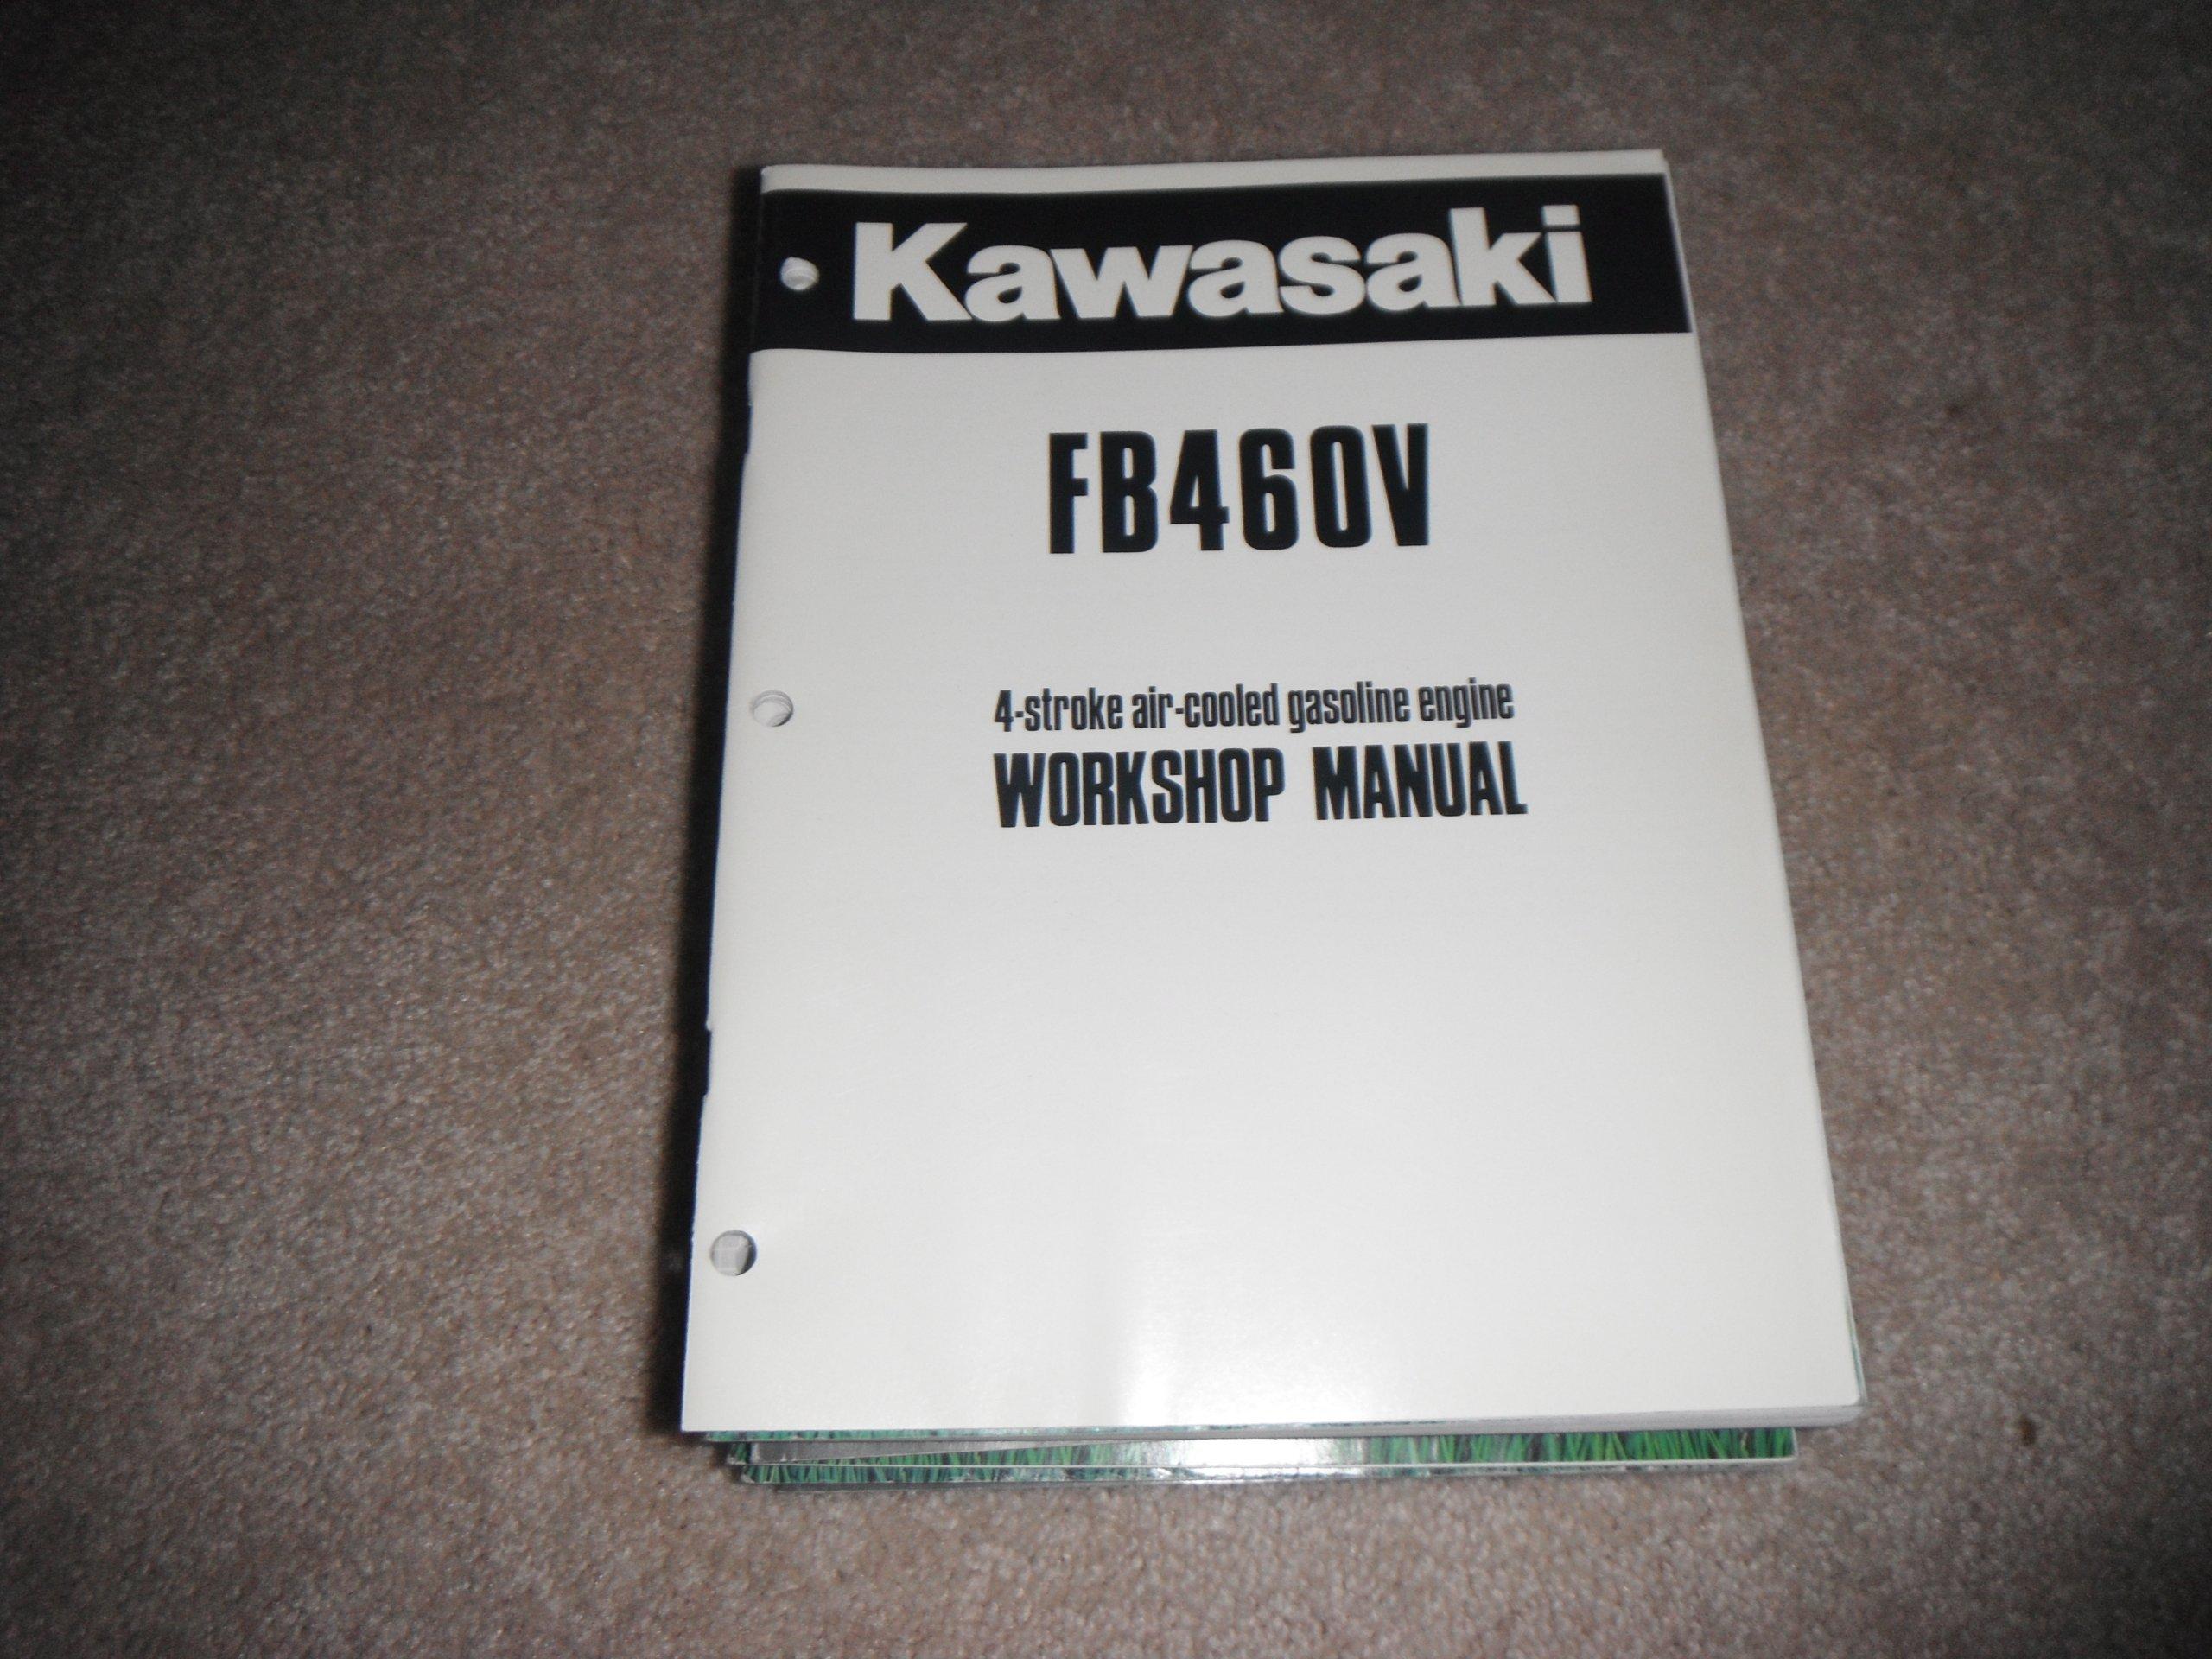 kawasaki fb460v 4 stroke air cooled gasoline engine service manual rh amazon com kawasaki fb460v workshop manual Kawasaki FB460V Parts Manual